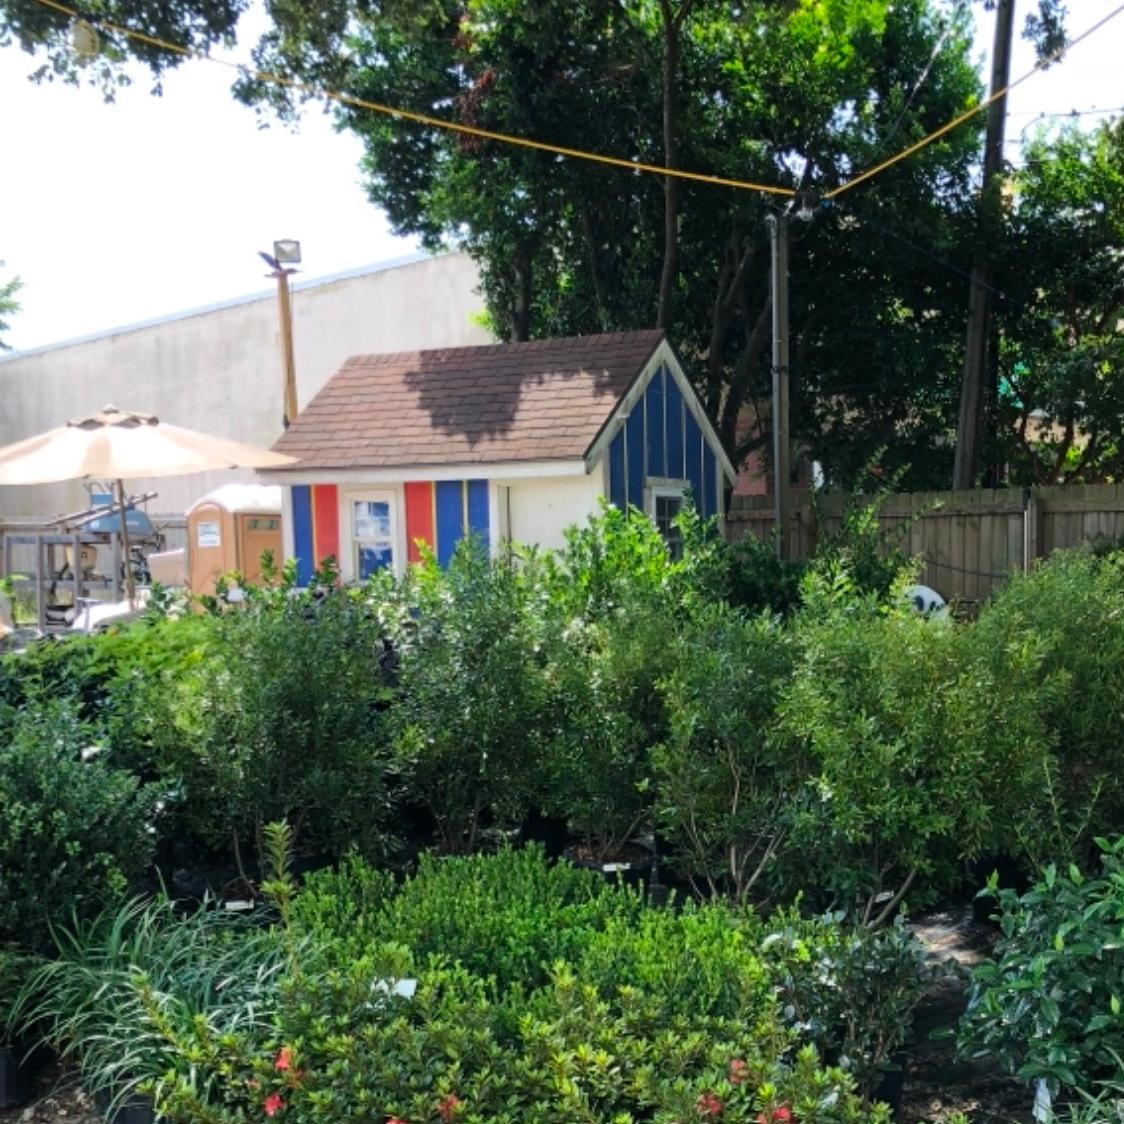 Buenavista's Landscaping